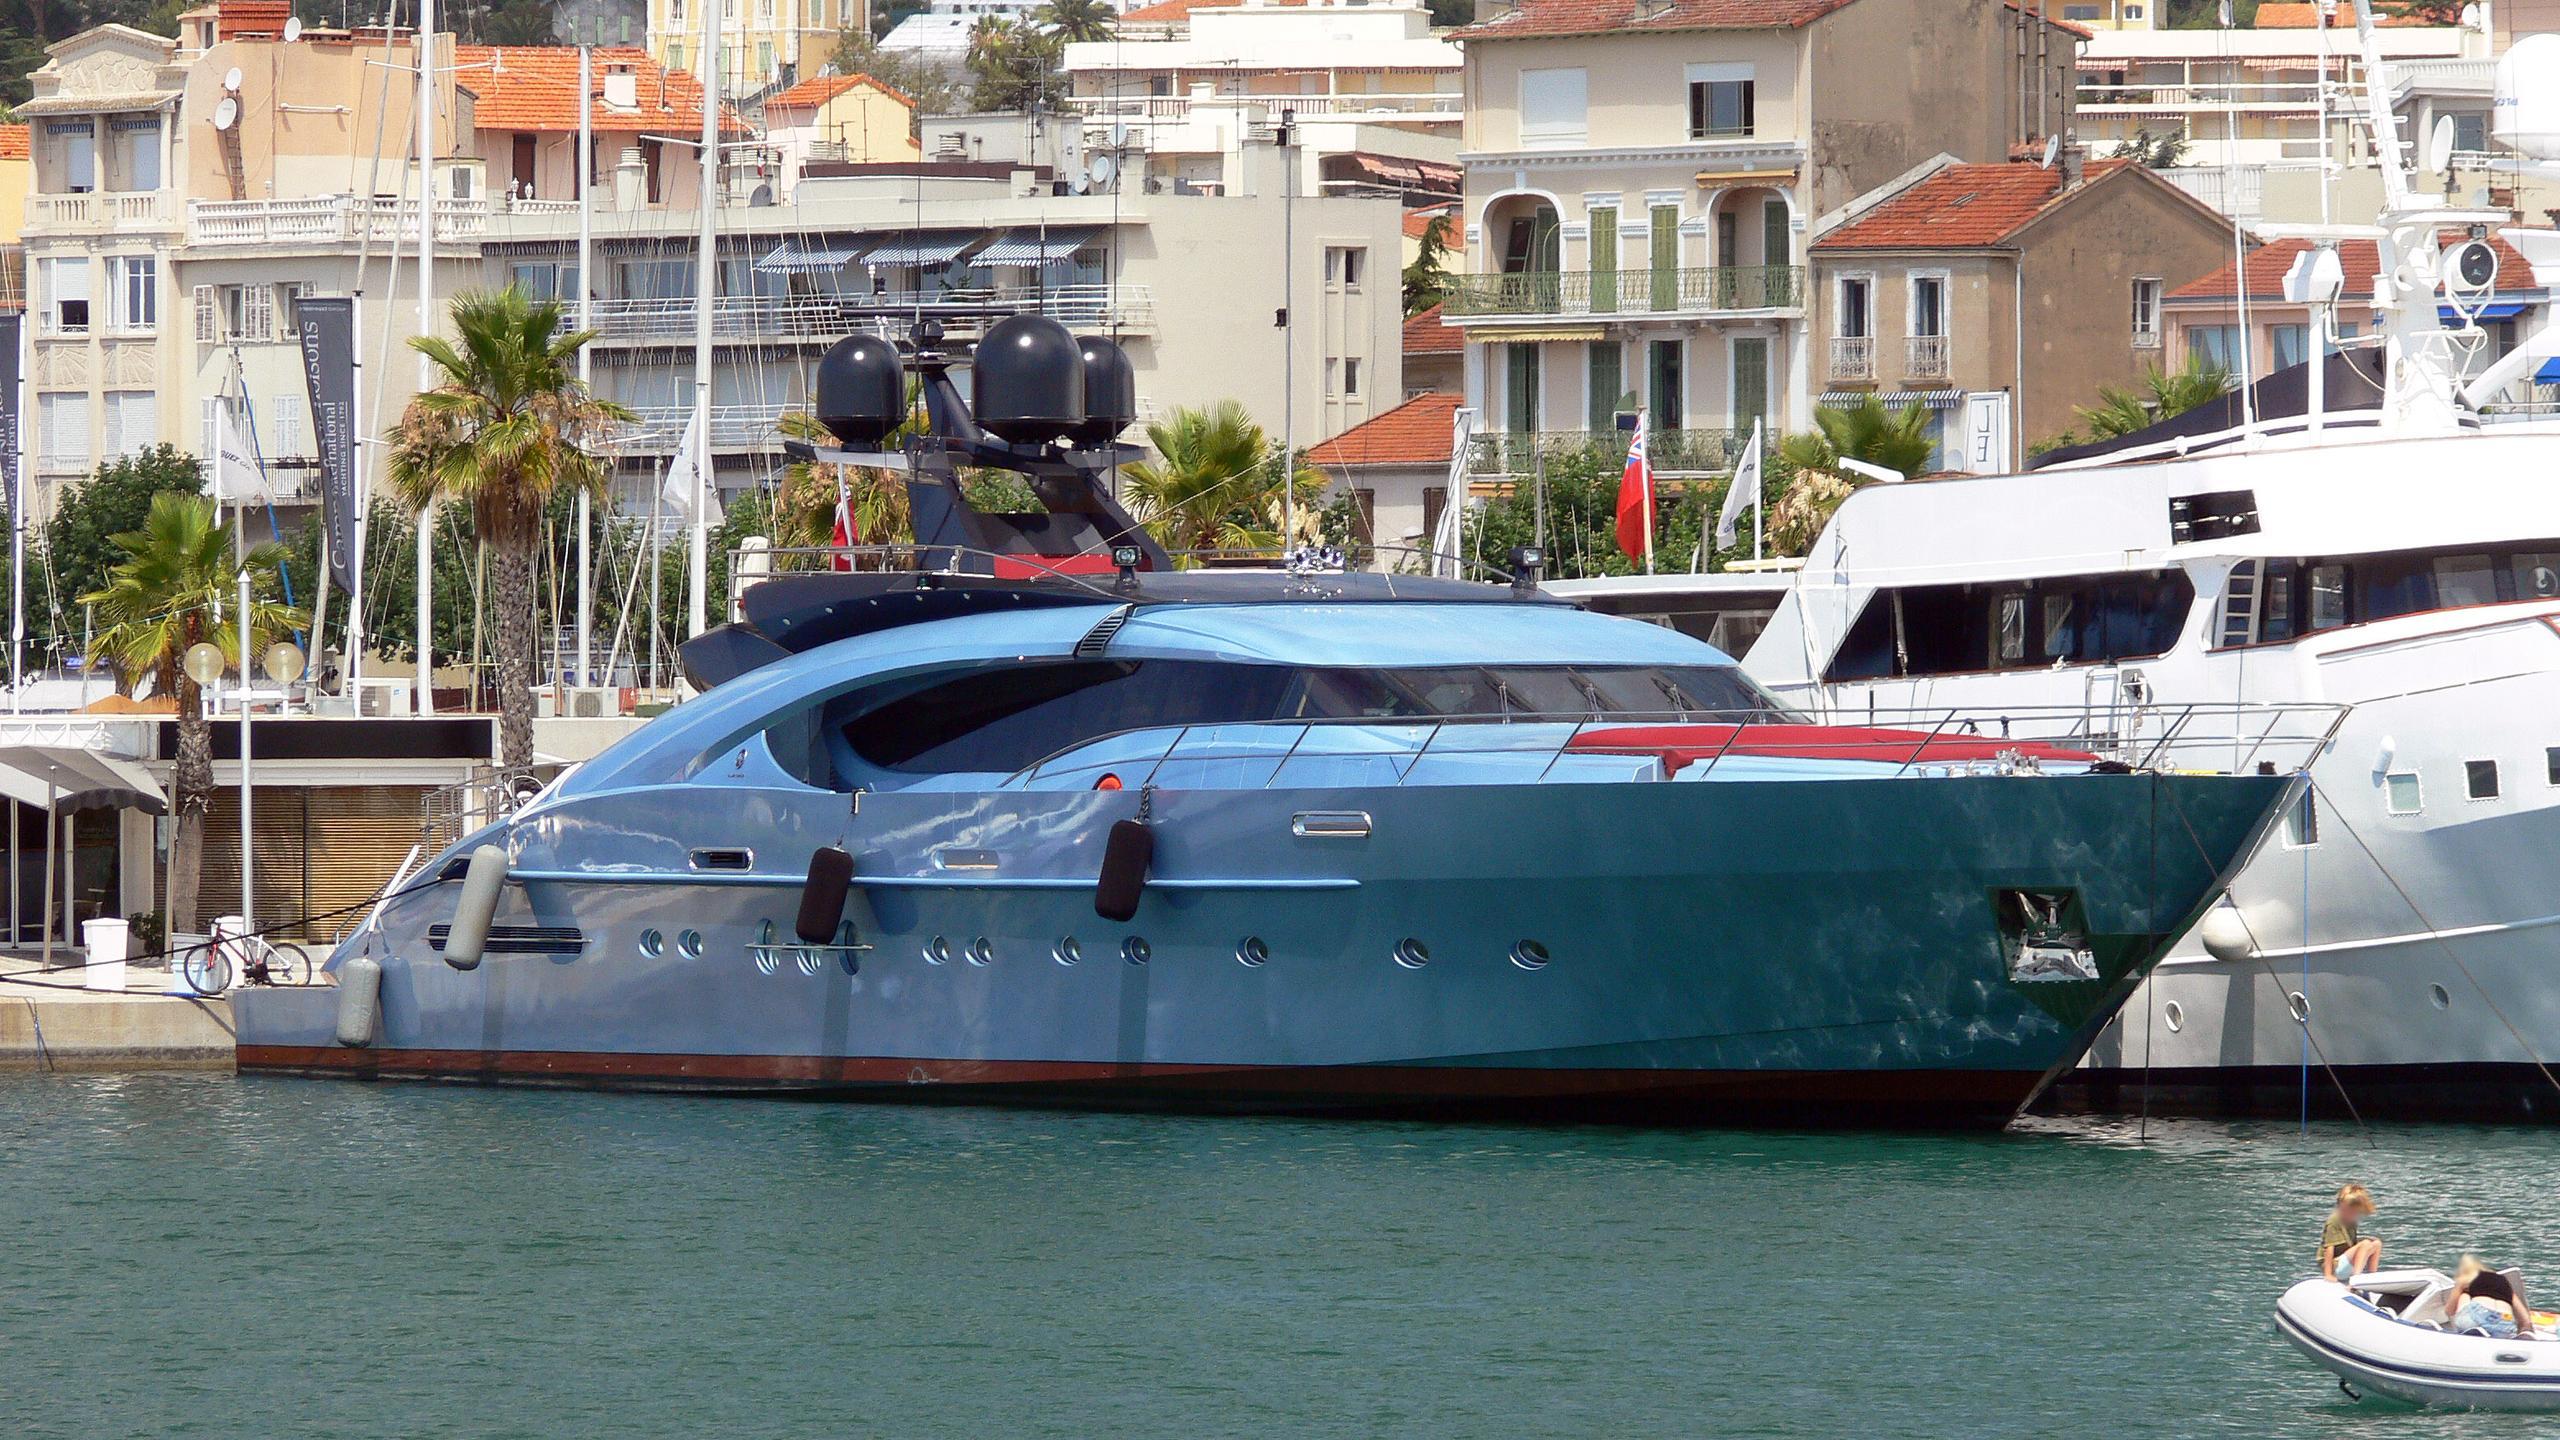 waverunner-motor-yacht-palmer-johnson-135-my-2007-41m-half-profile